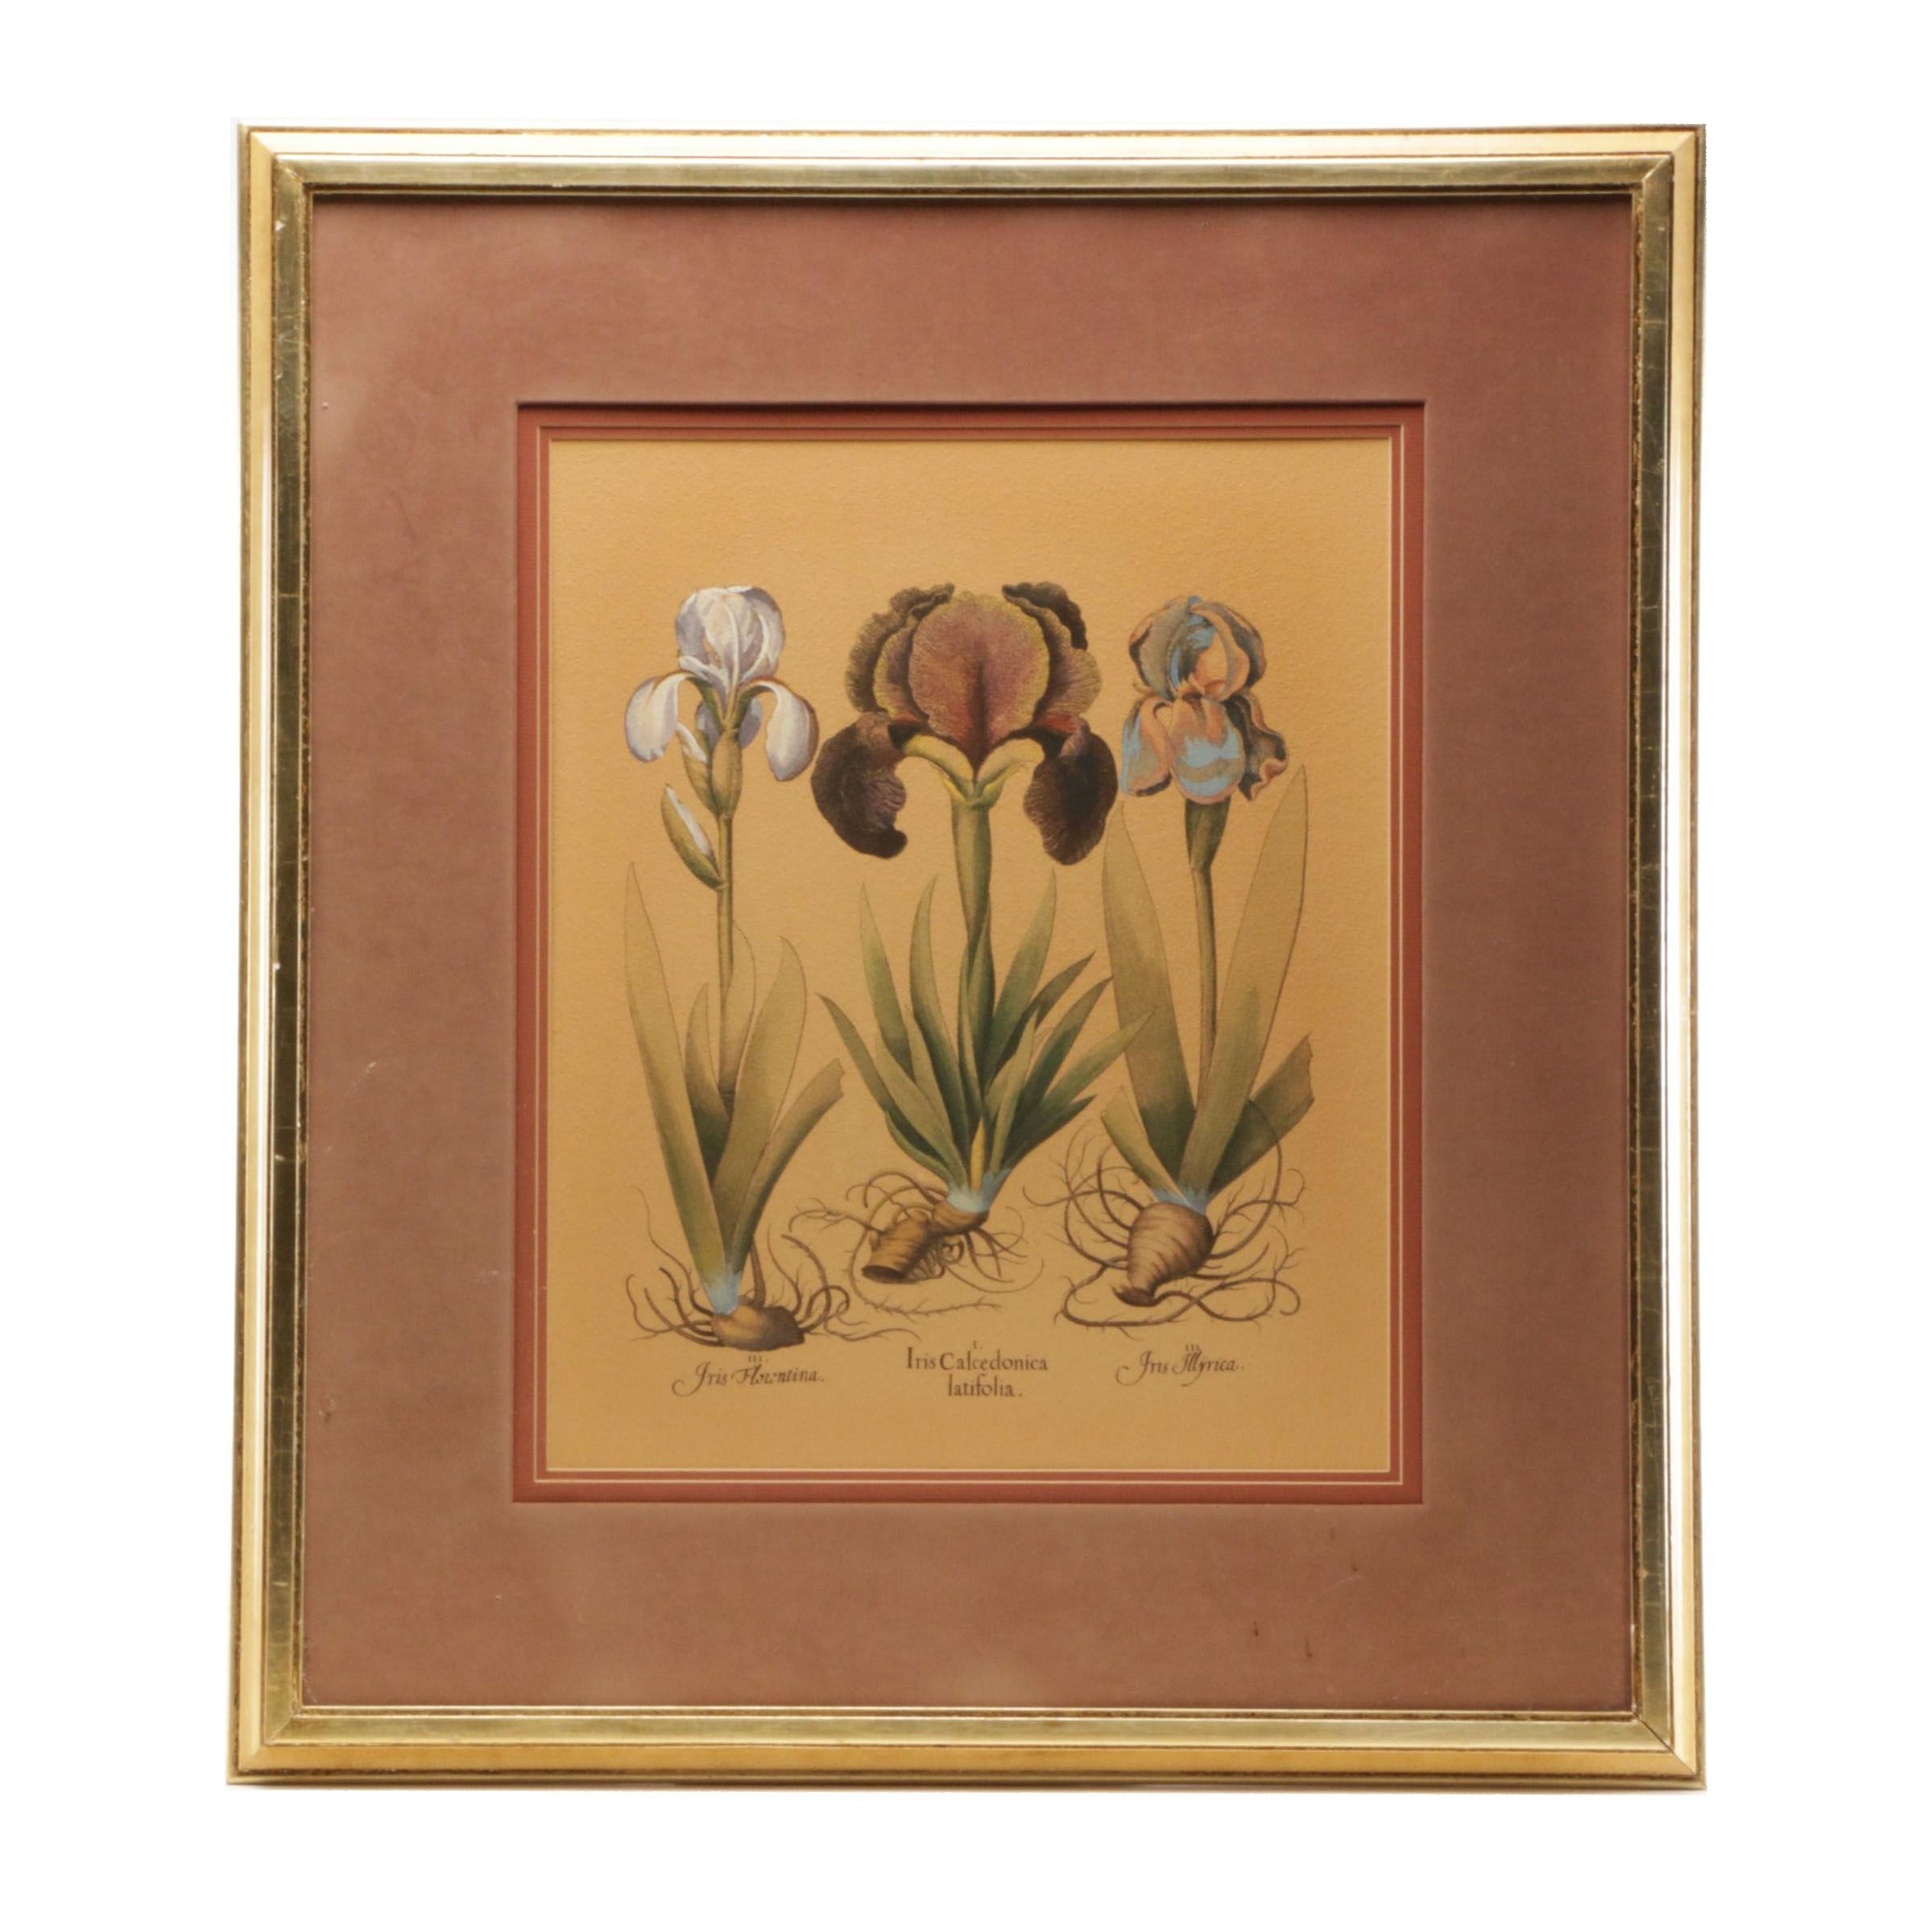 Hand Colored Etching of Iris Botanical Illustrations